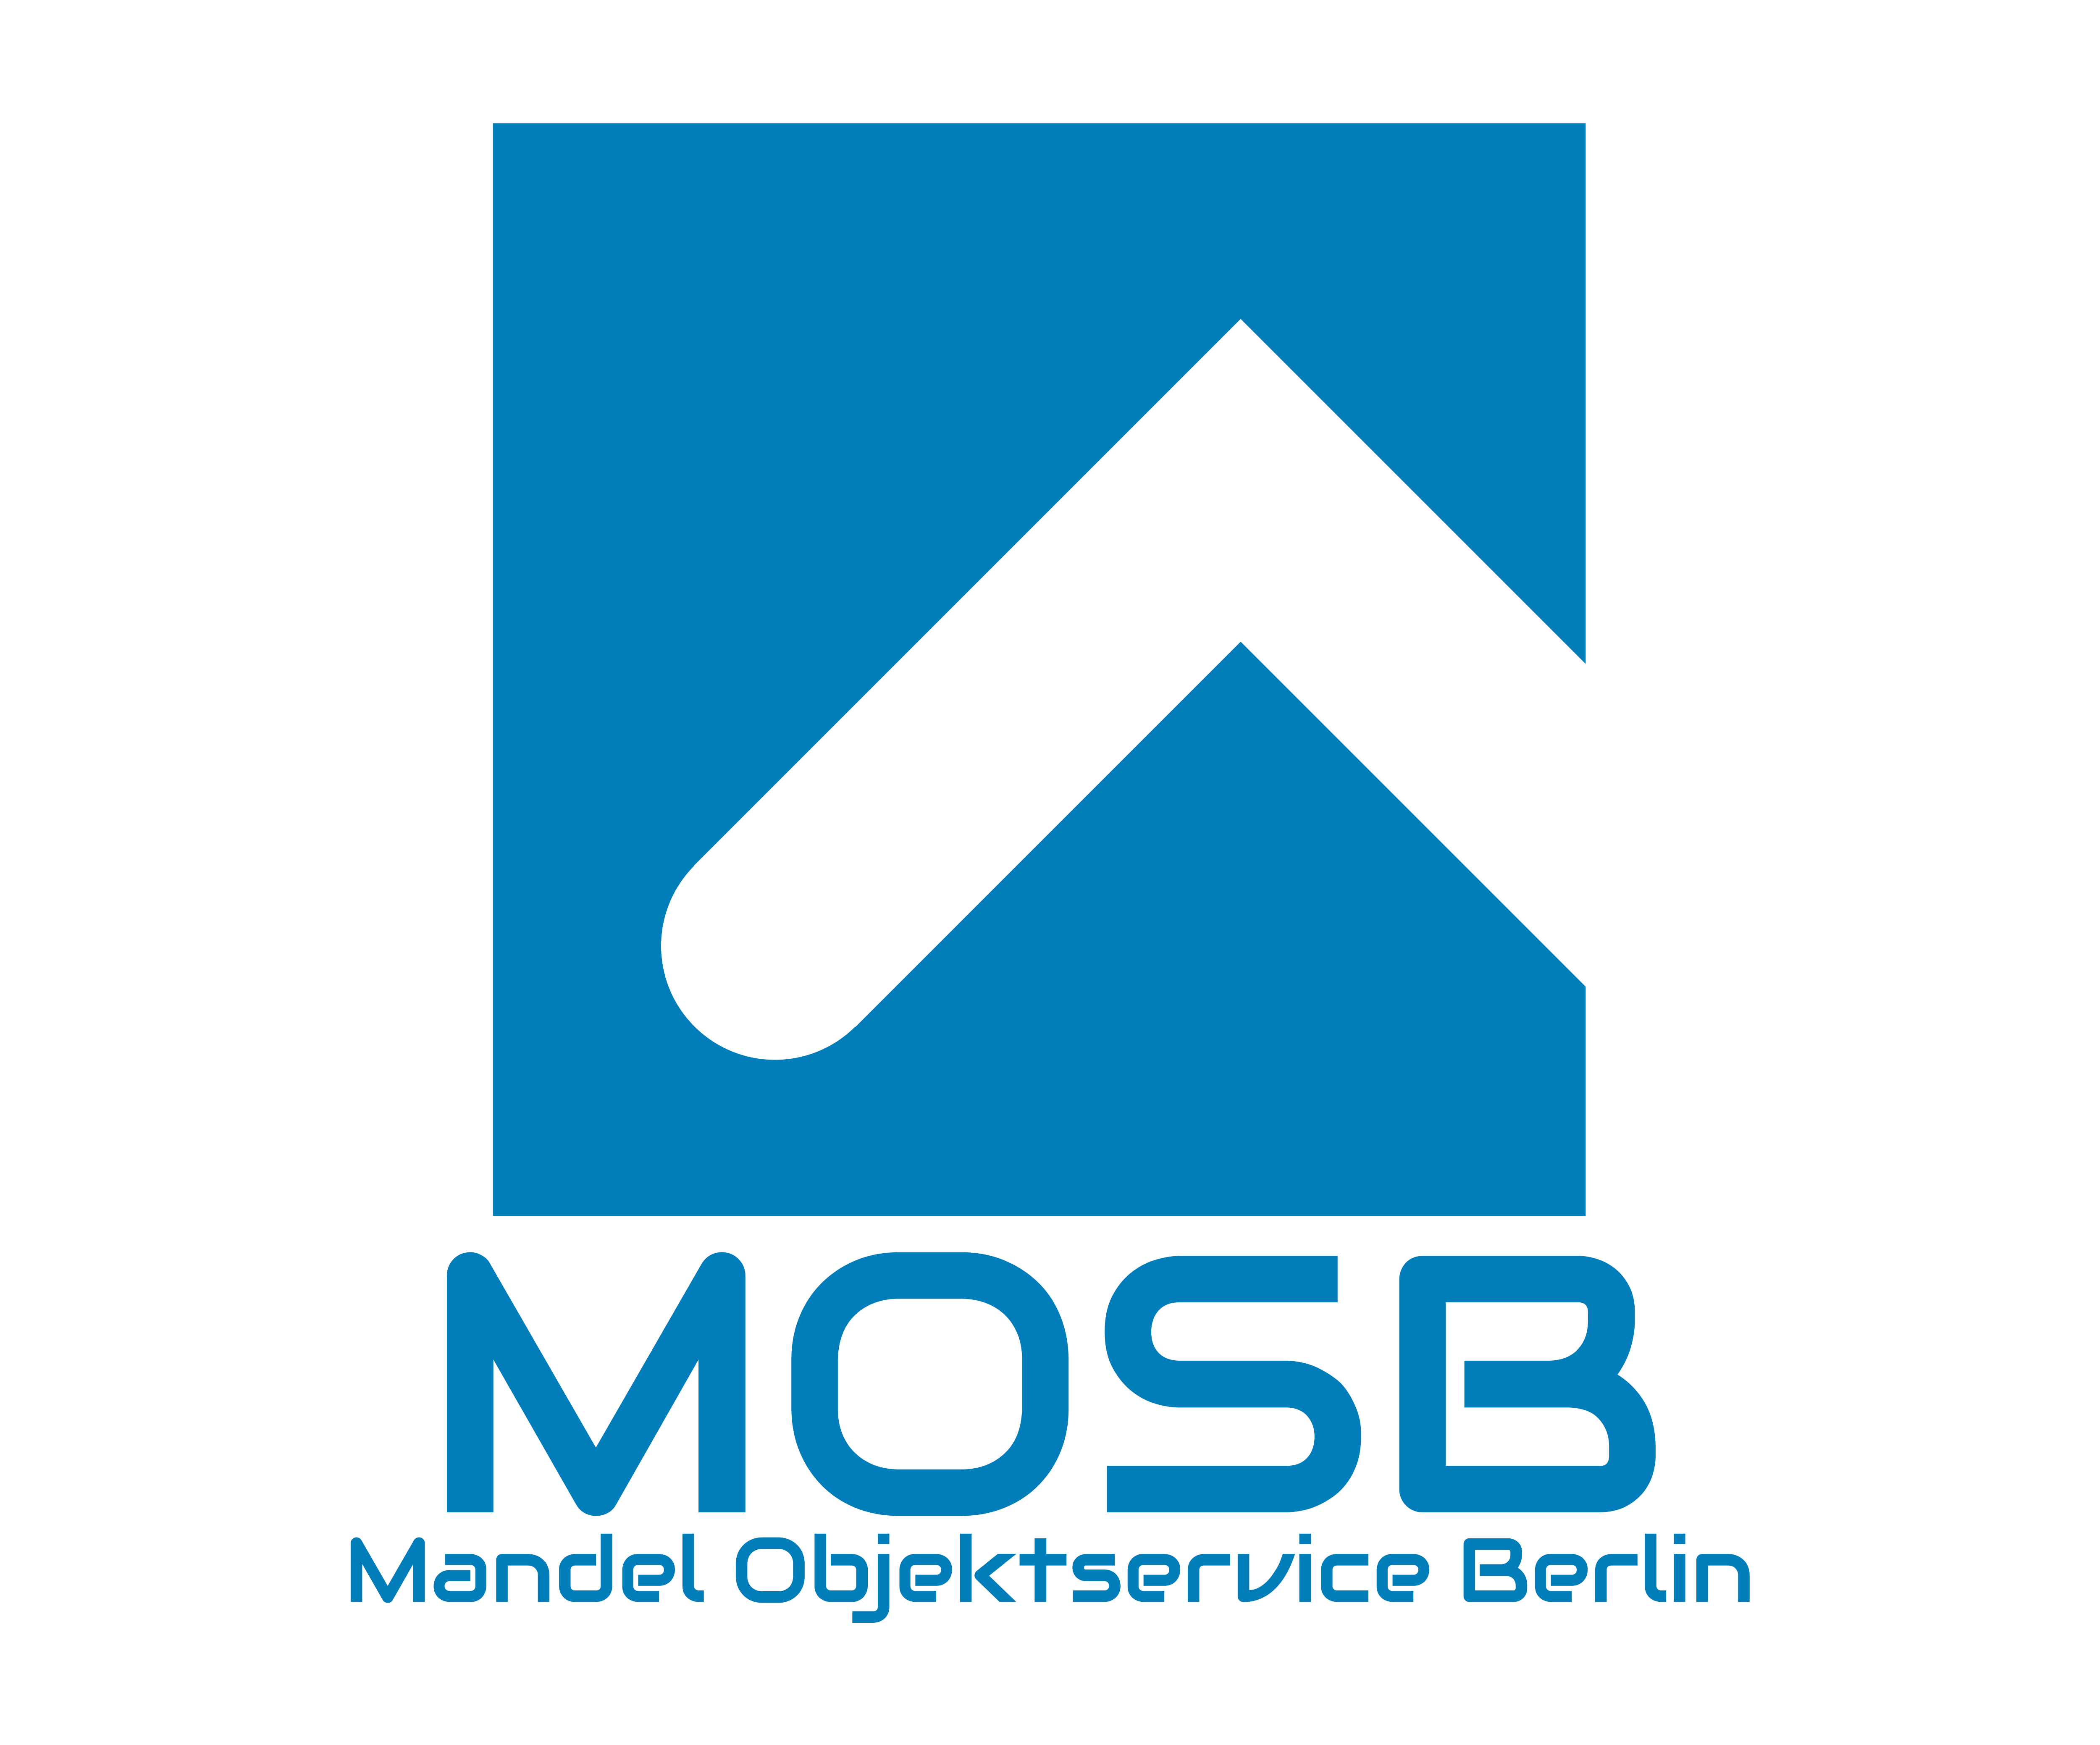 Mandel Objektservice Berlin